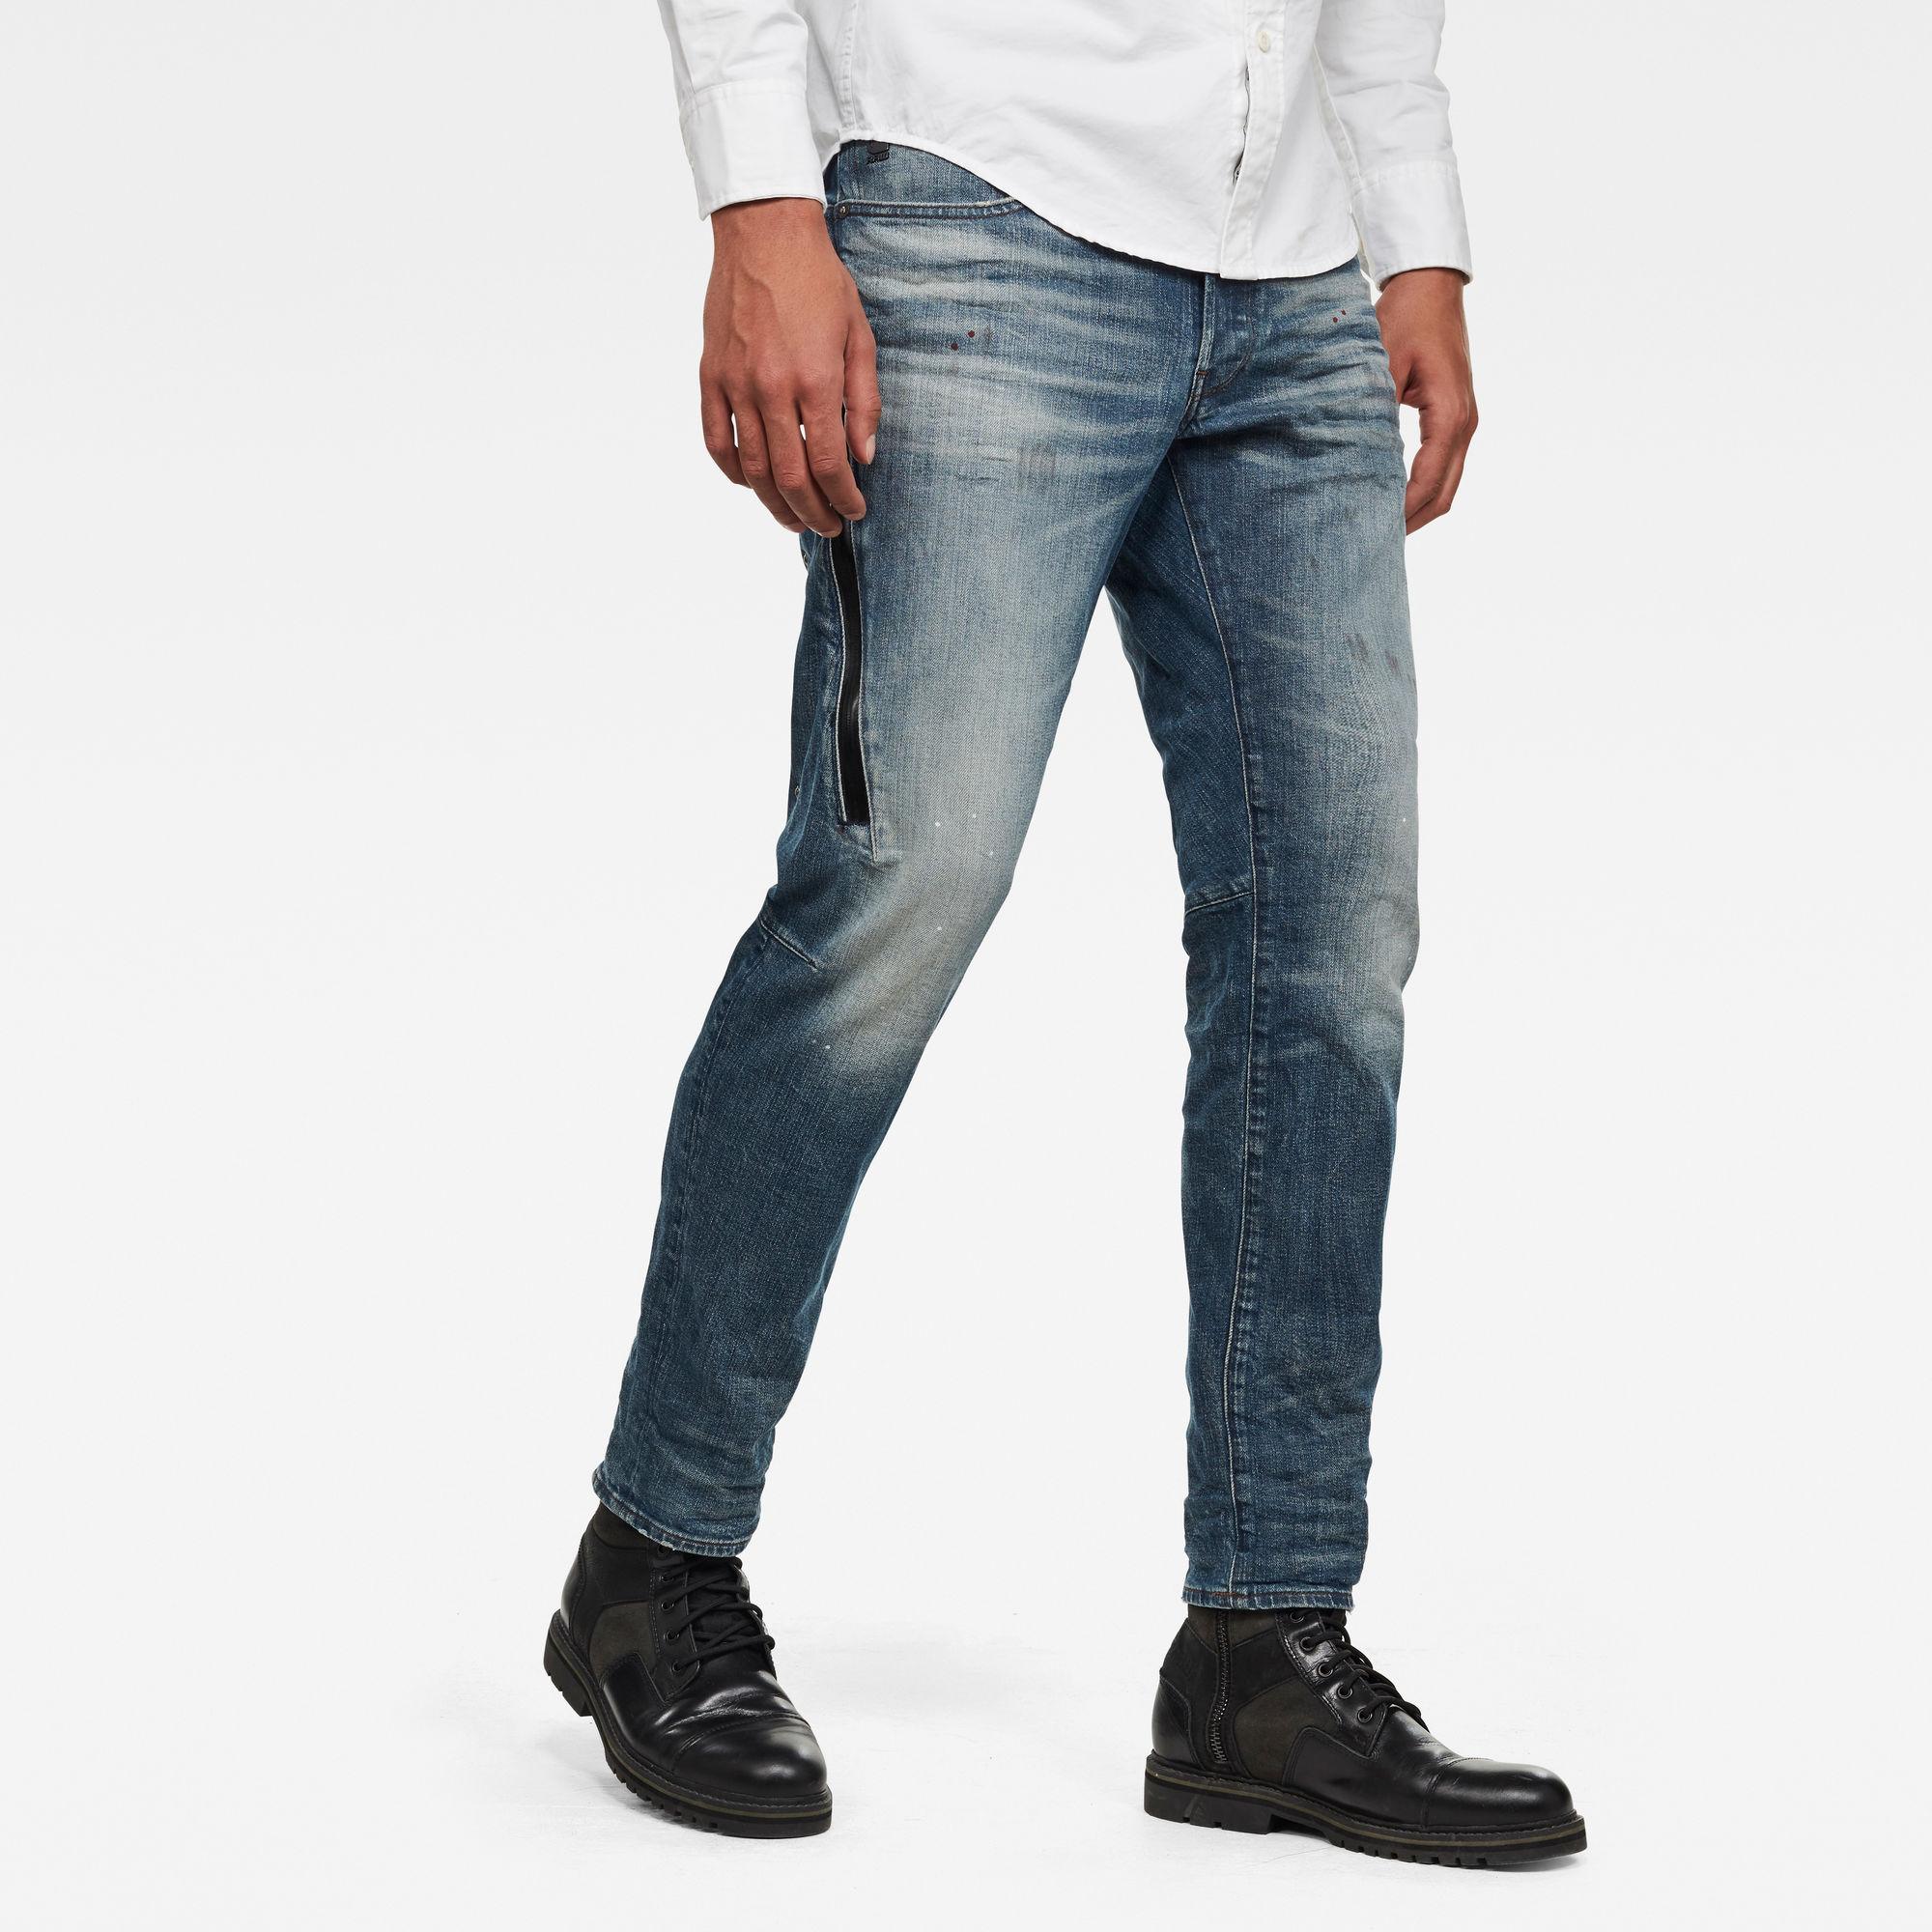 G-Star RAW Heren Citishield 3D Slim Tapered Jeans Blauw